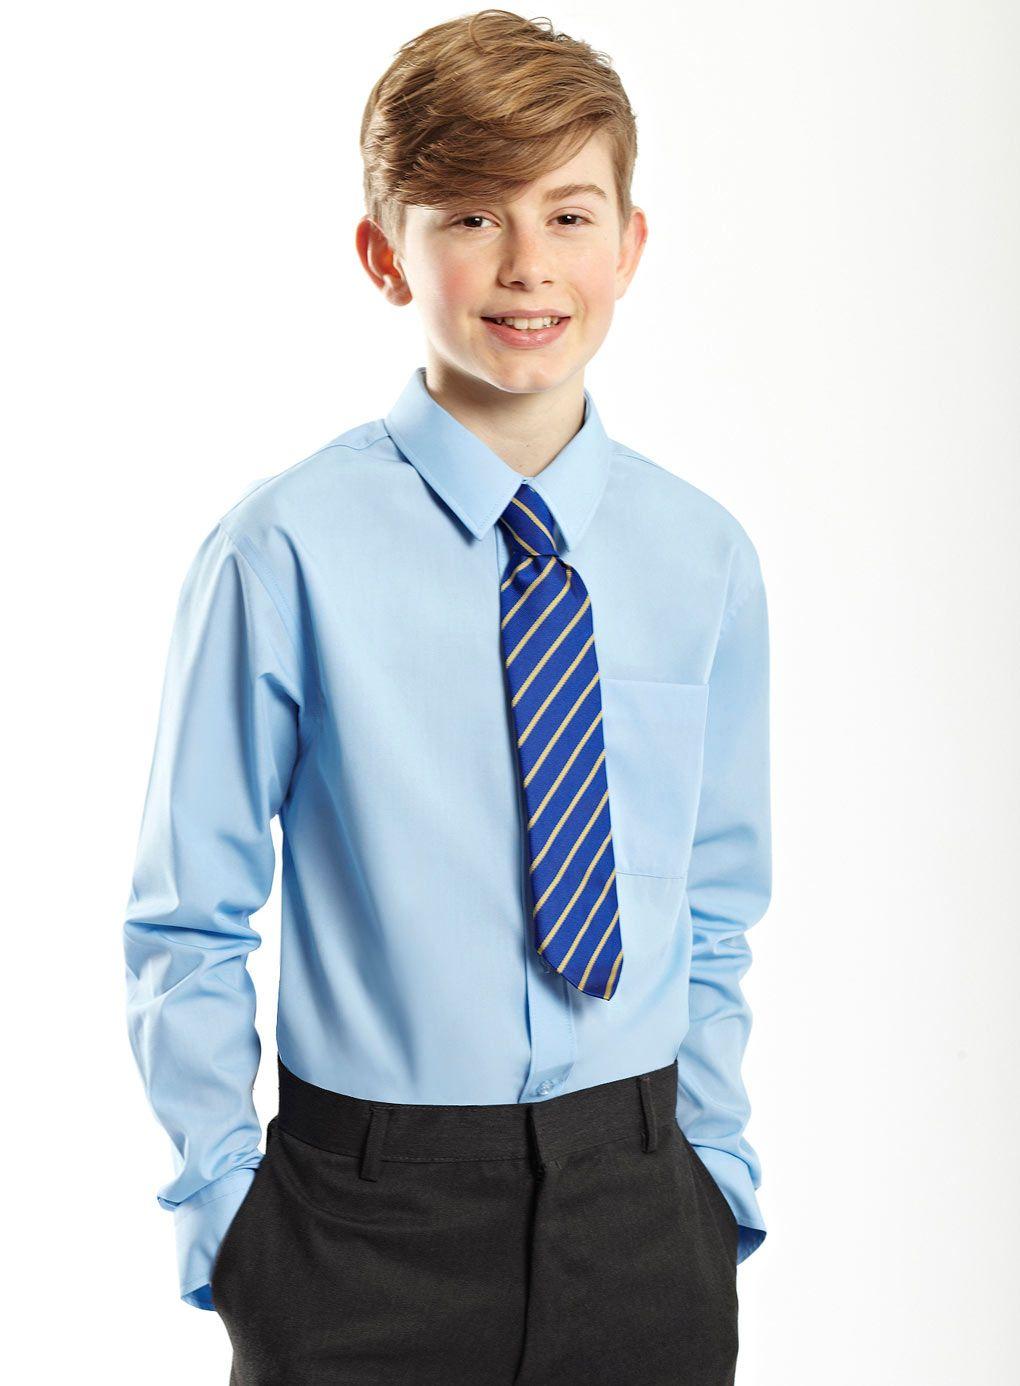 School uniform: Do school uniforms help improve social ...